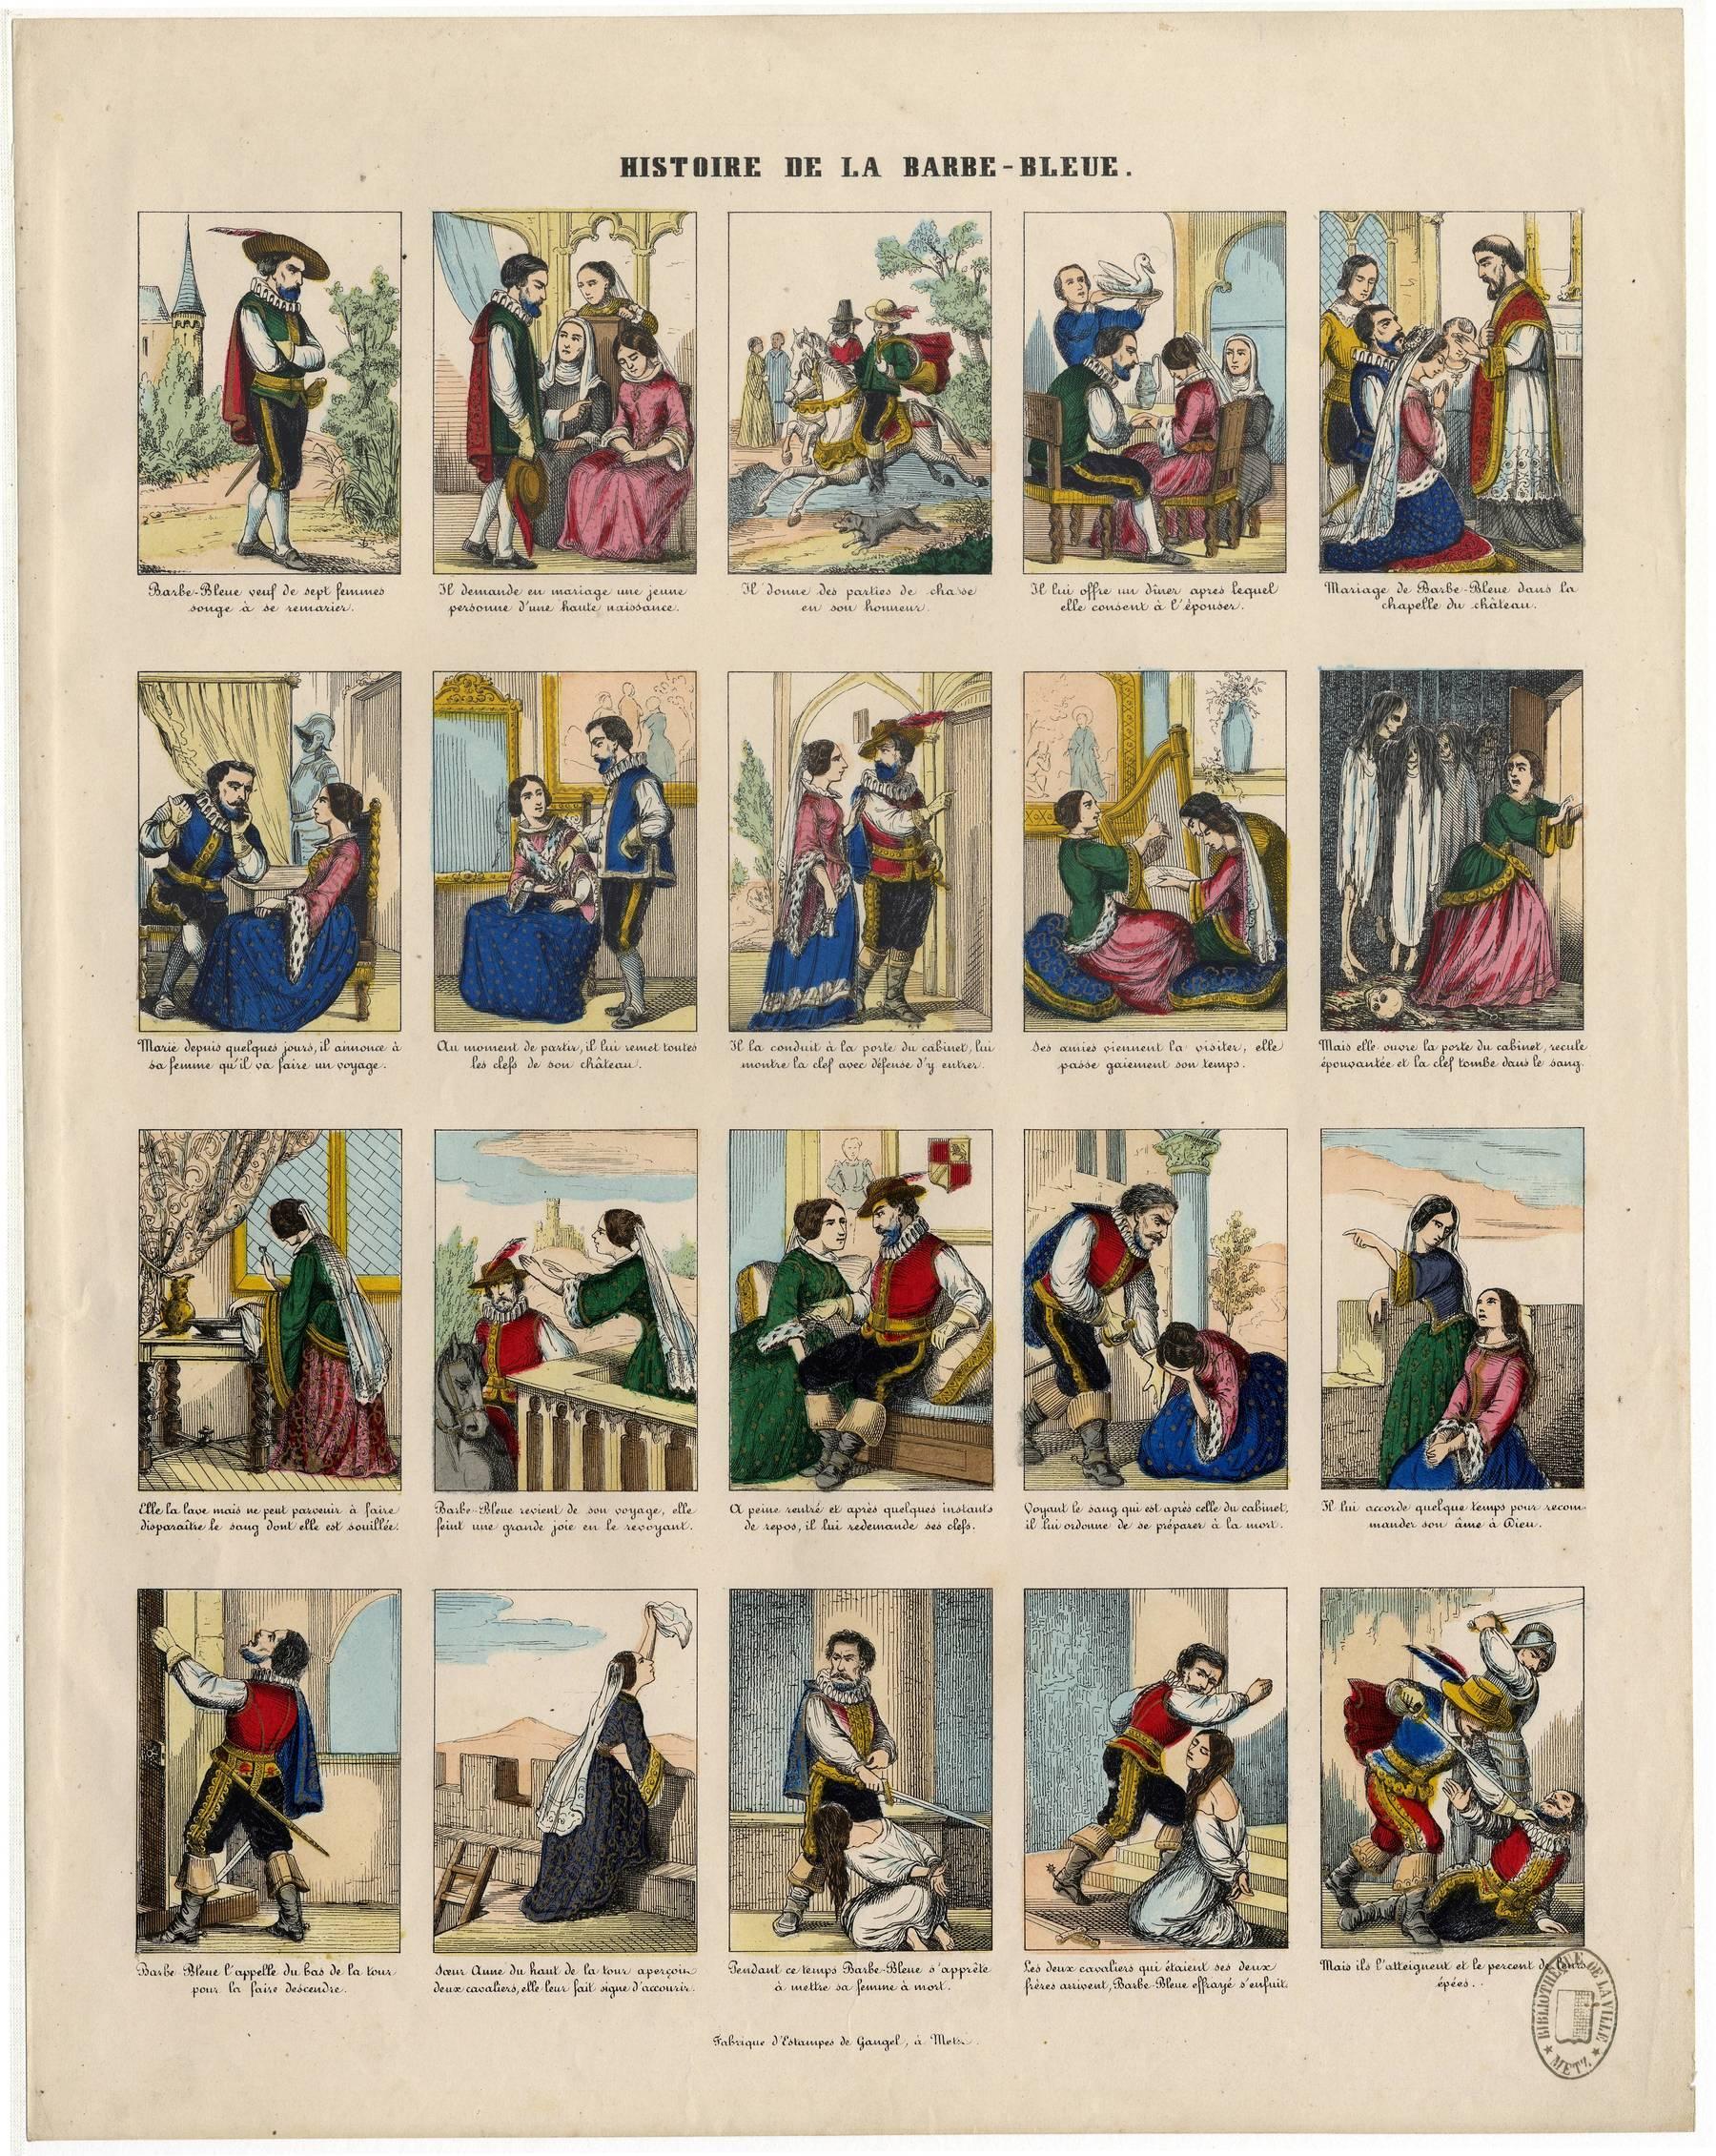 Contenu du Histoire de la Barbe-bleue